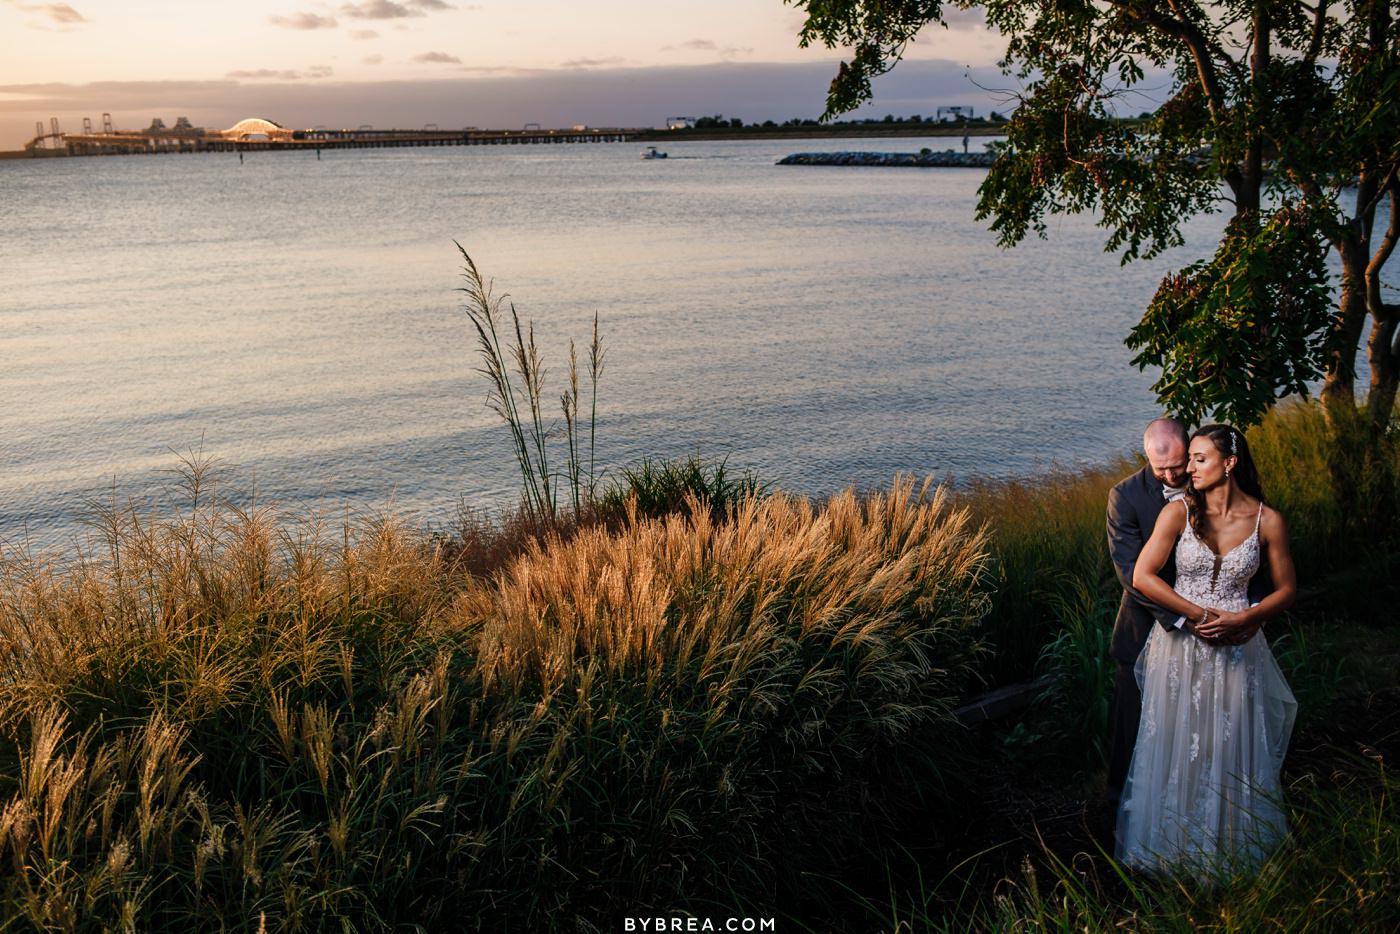 chesapeake bay beach club wedding photos at sunset